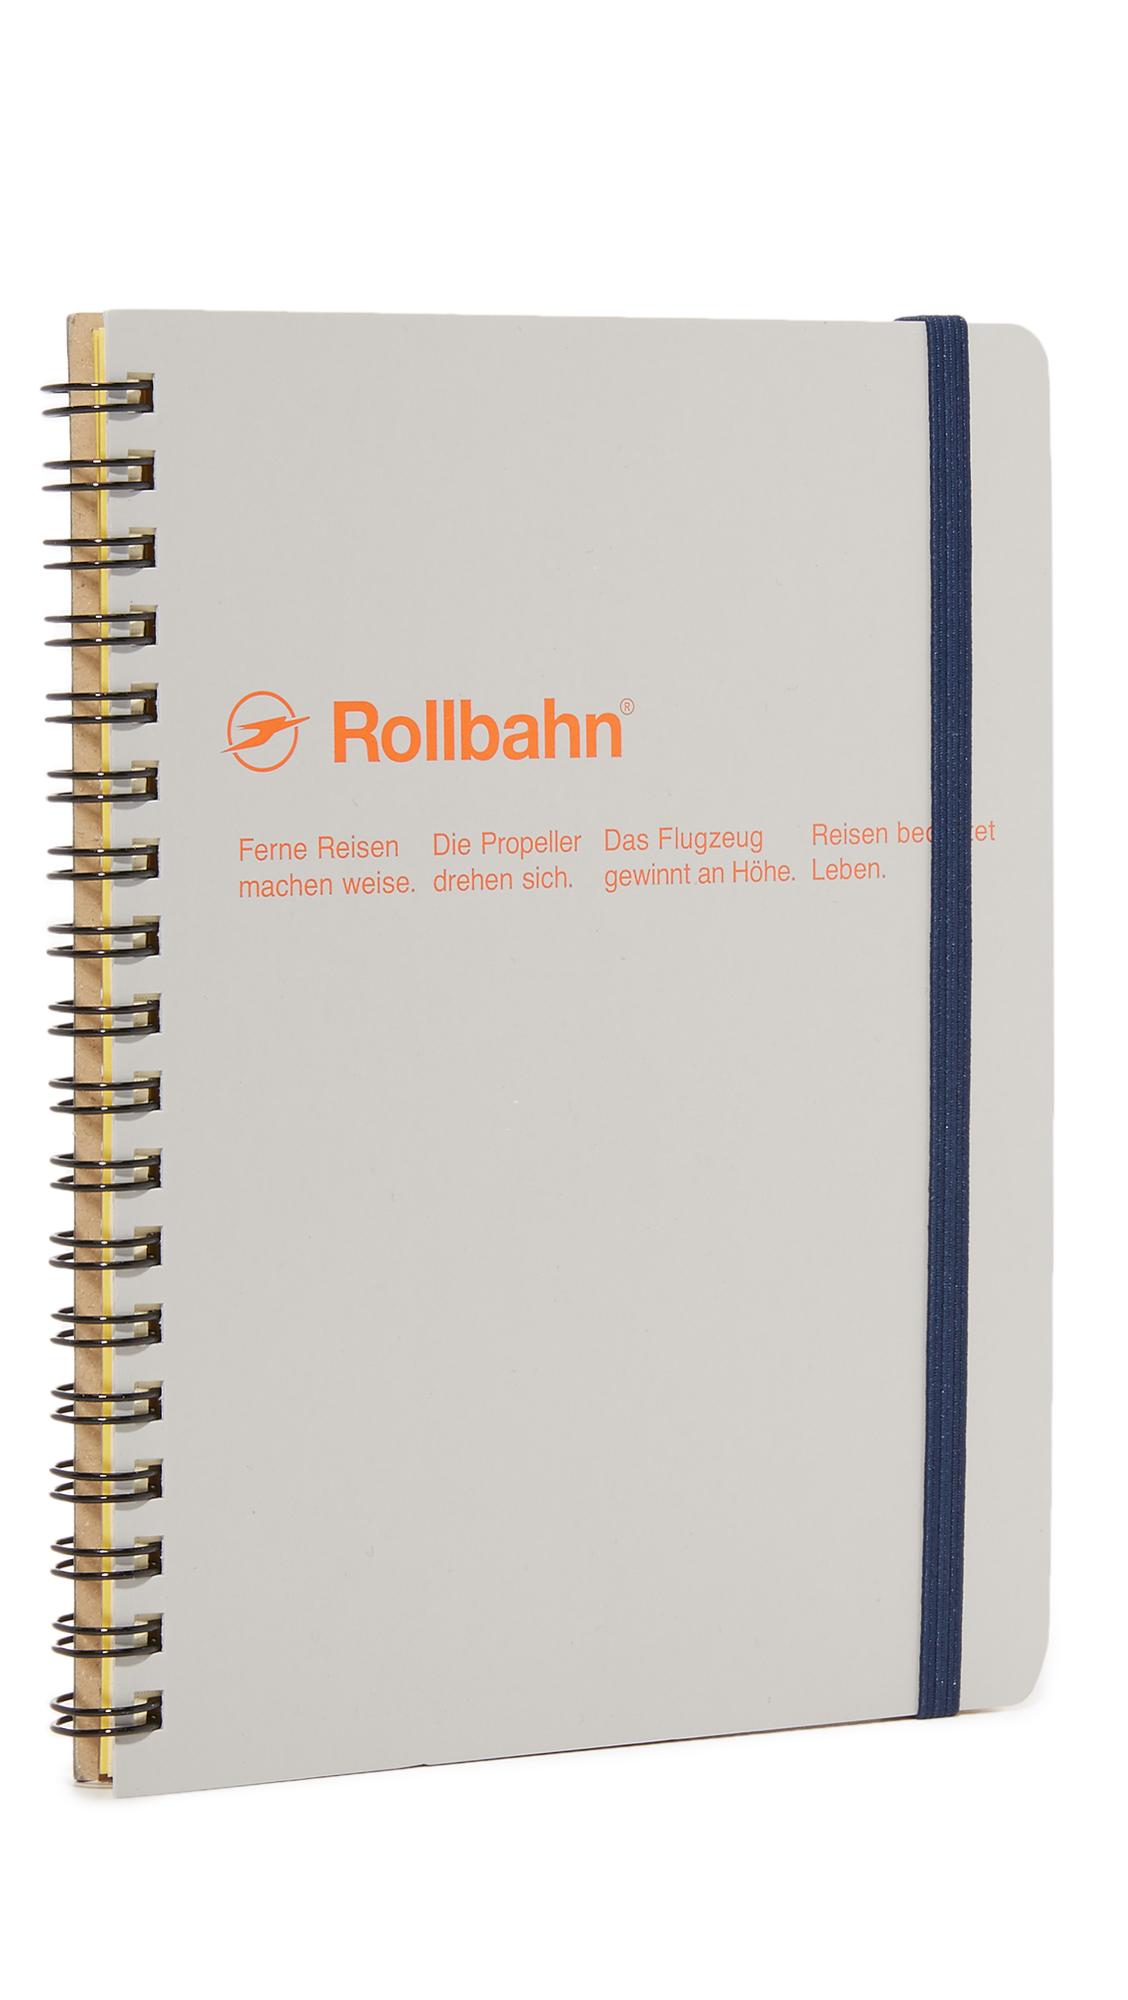 DELFONICS Rollbahn Spiral Notebook in Ash Grey